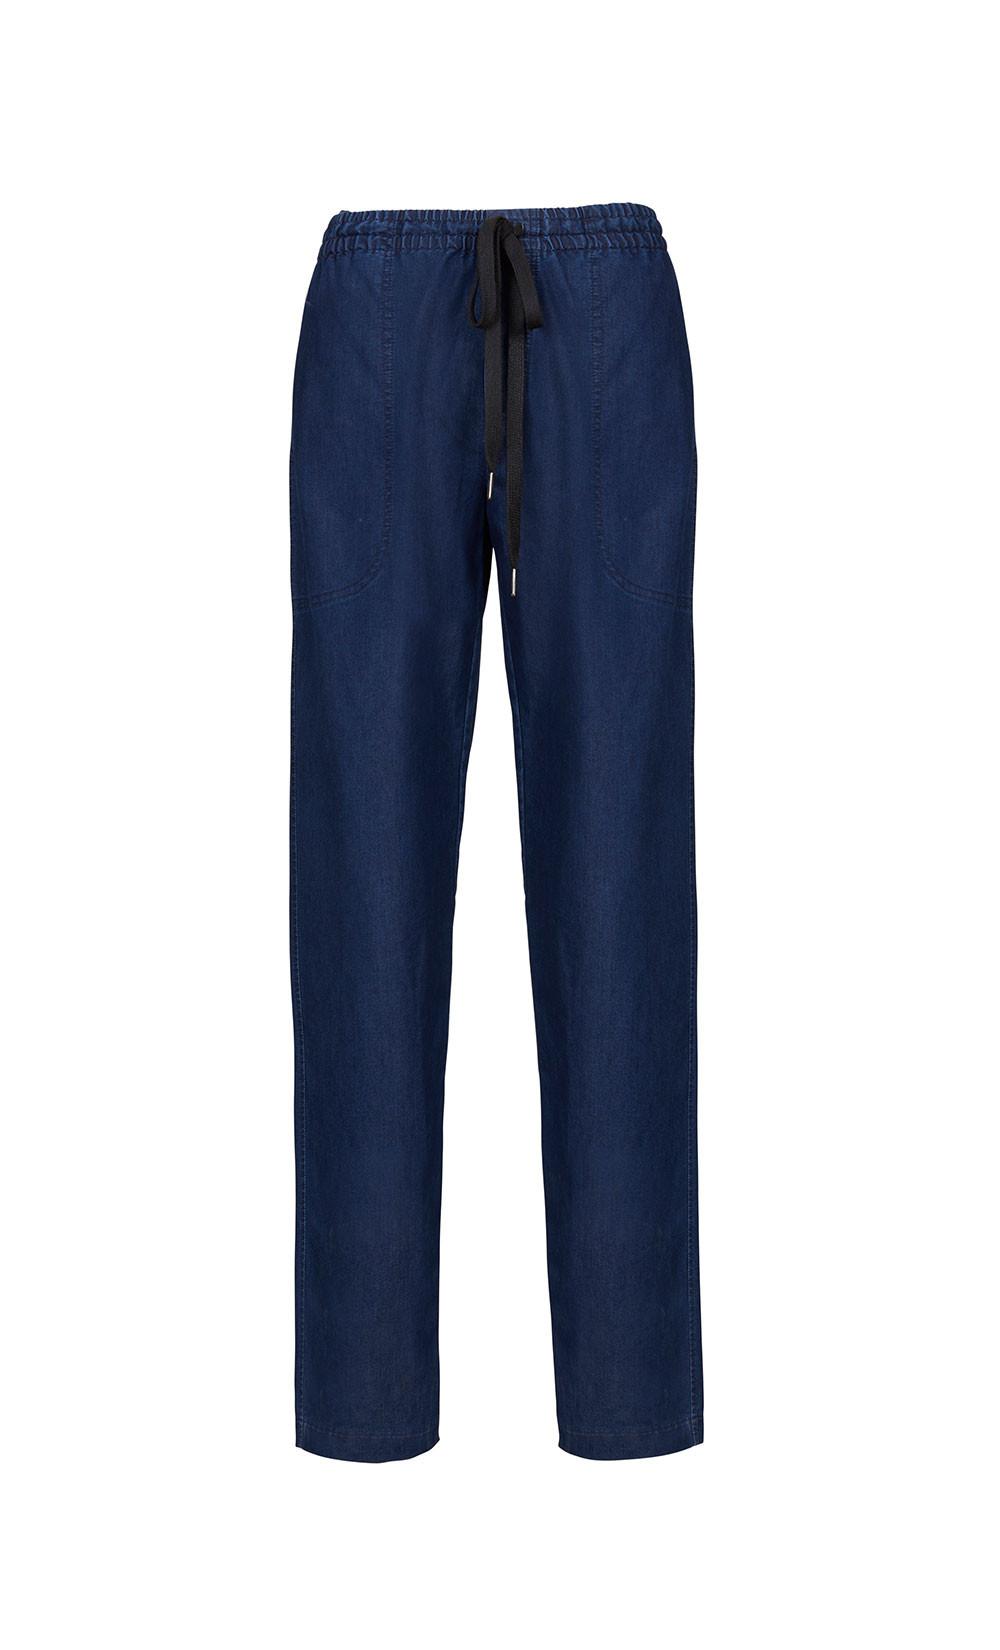 Aikido Jeans Pants